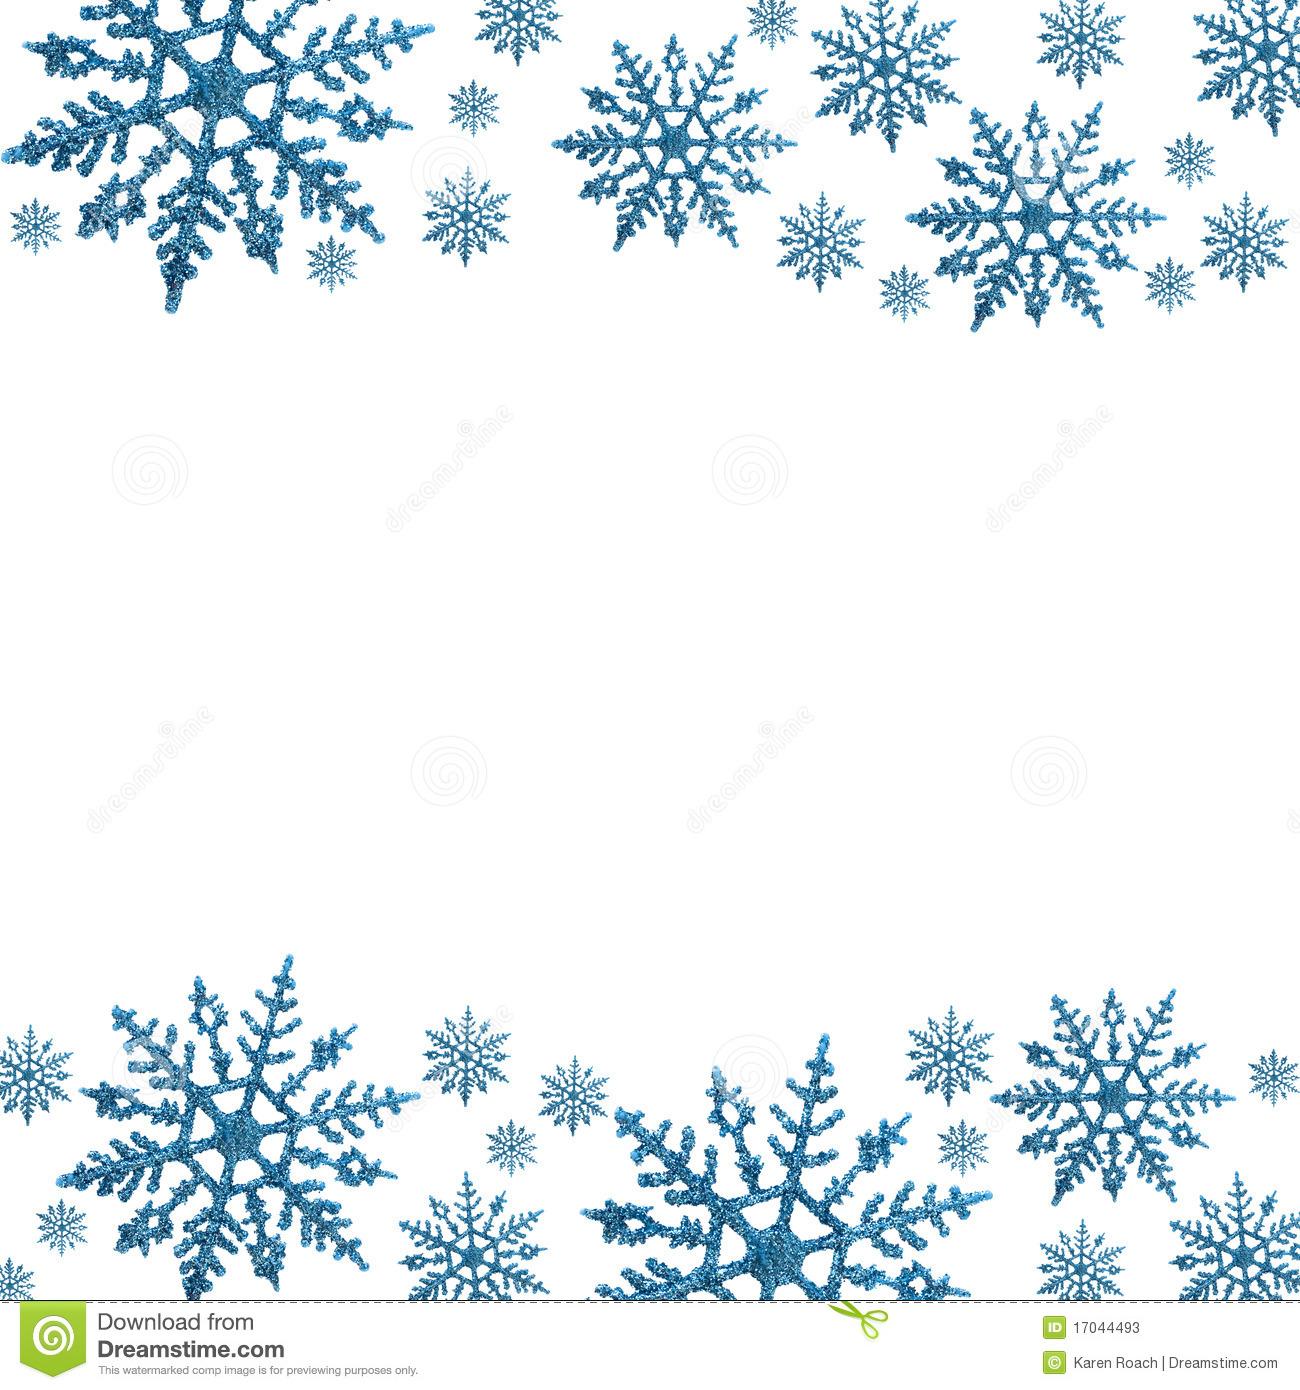 68+ Free Snowflake Border Clipart.